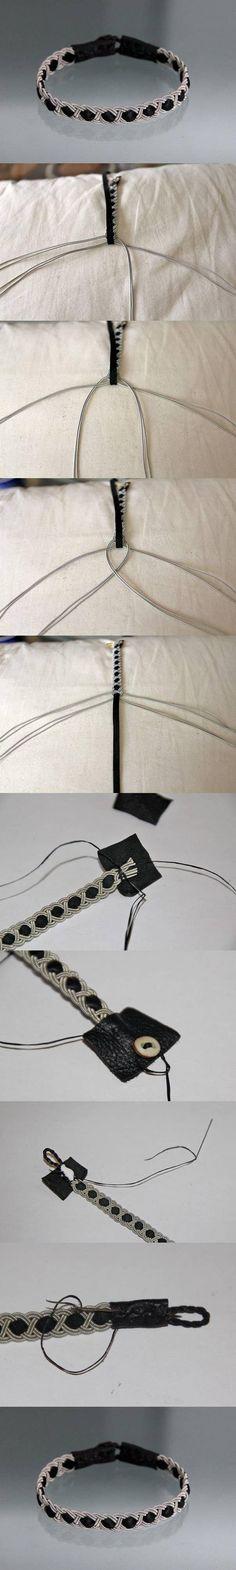 DIY cord braided bracelet. Craft ideas from LC.Pandahall.com  #pandahall